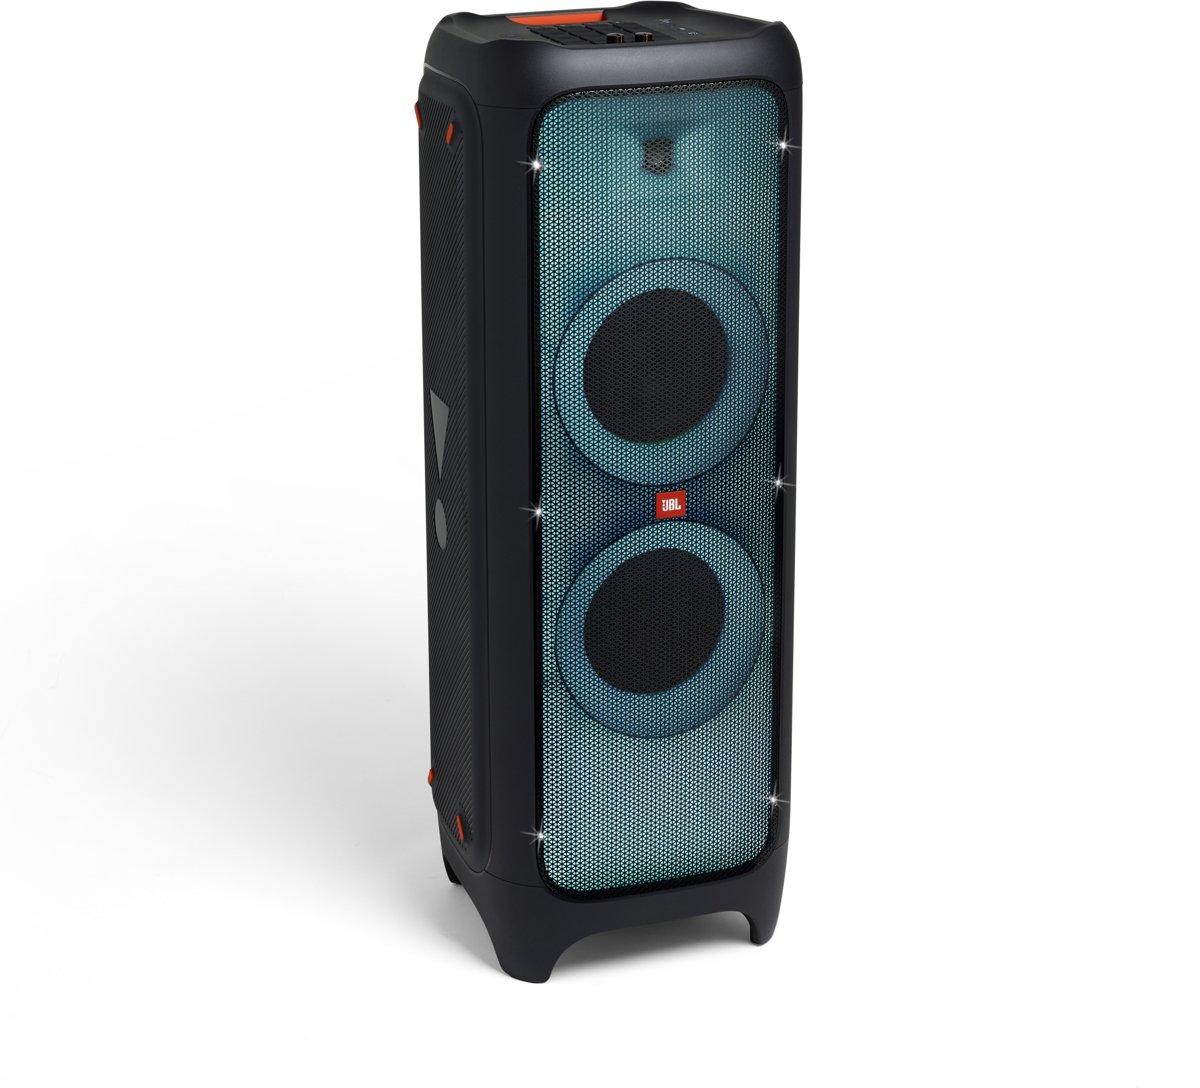 Party speaker 30.5 cm 12 inch JBL Partybox 1000 1 stuks